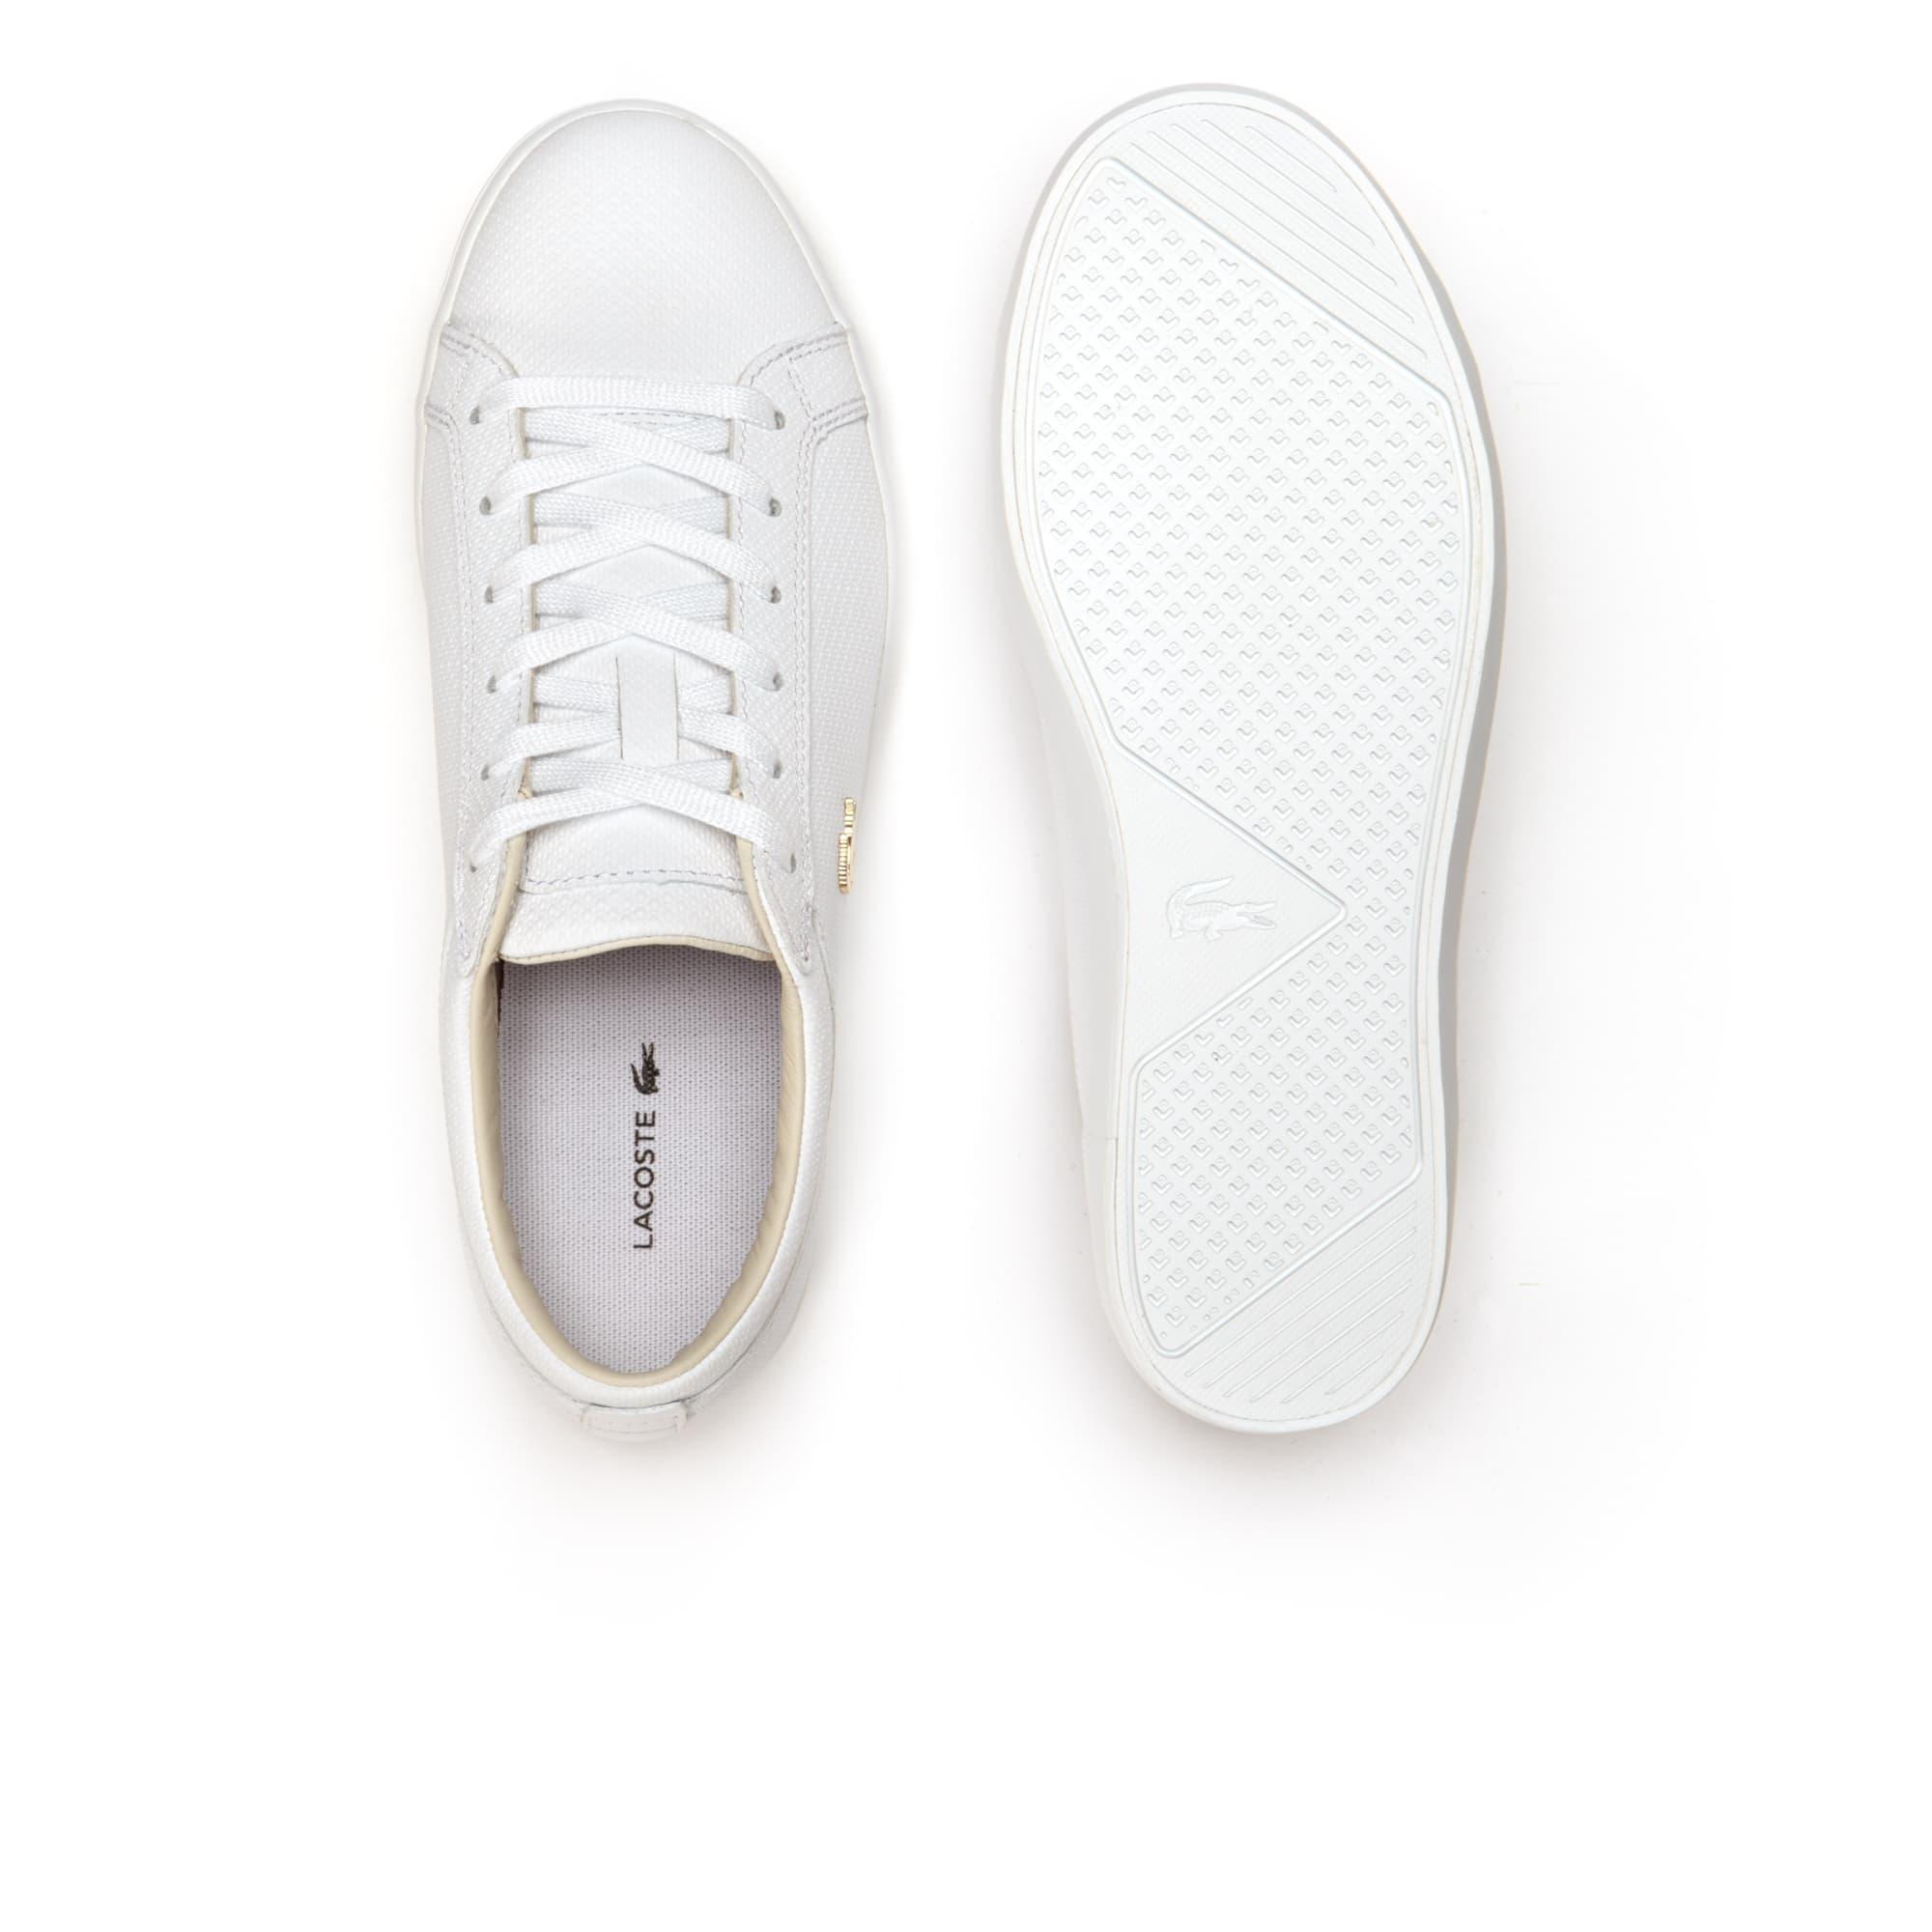 Doré Femme En Cuir Avec Crocodile Straighset Sneakers XO8wkPn0